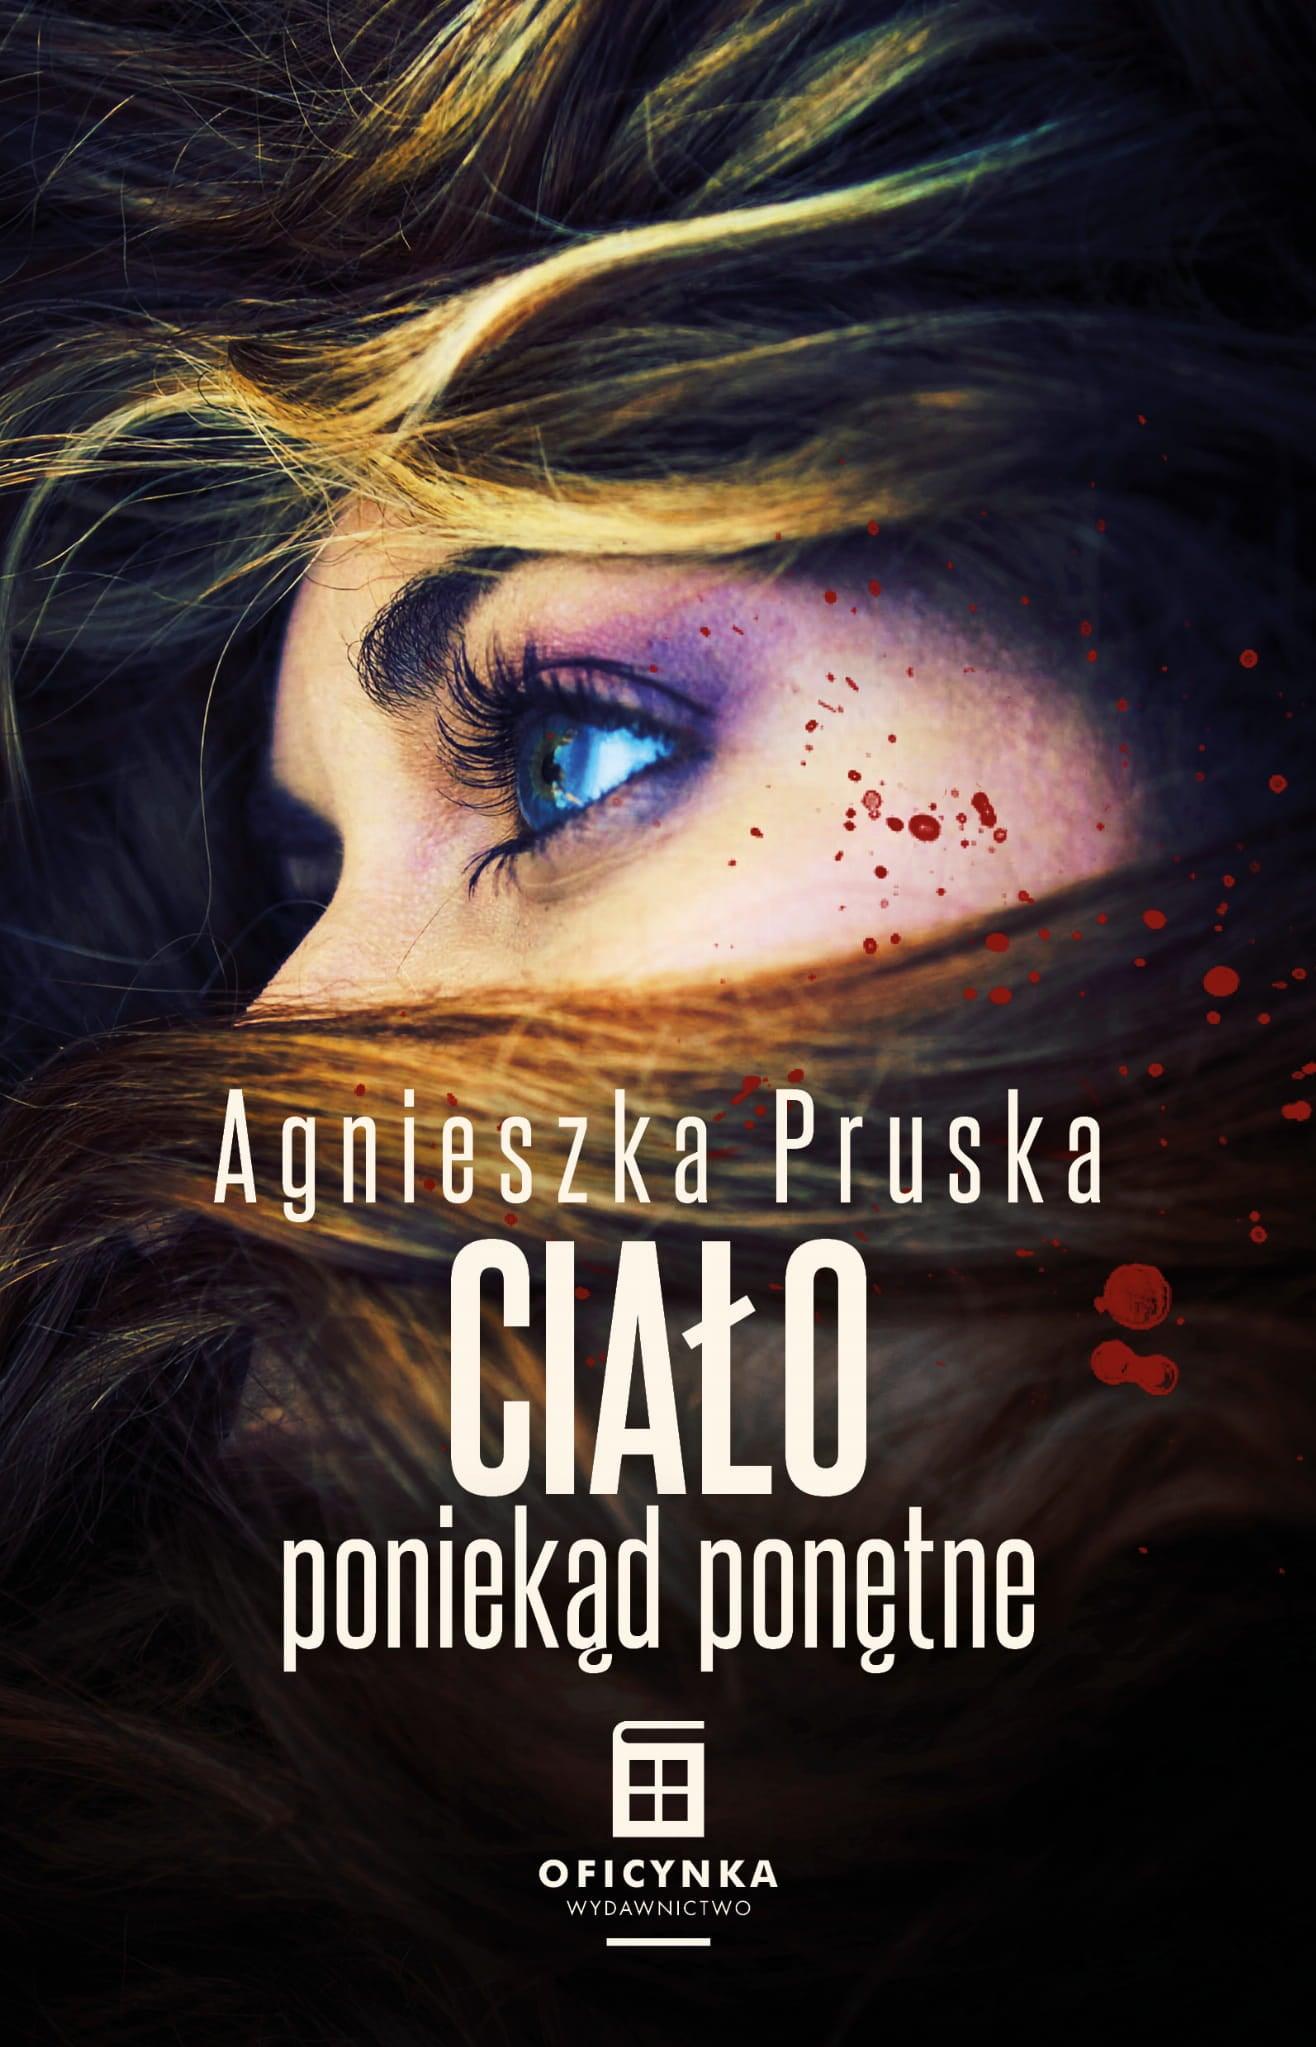 Agnieszka Pruska - Ciało poniekąd ponętne. Recenzja